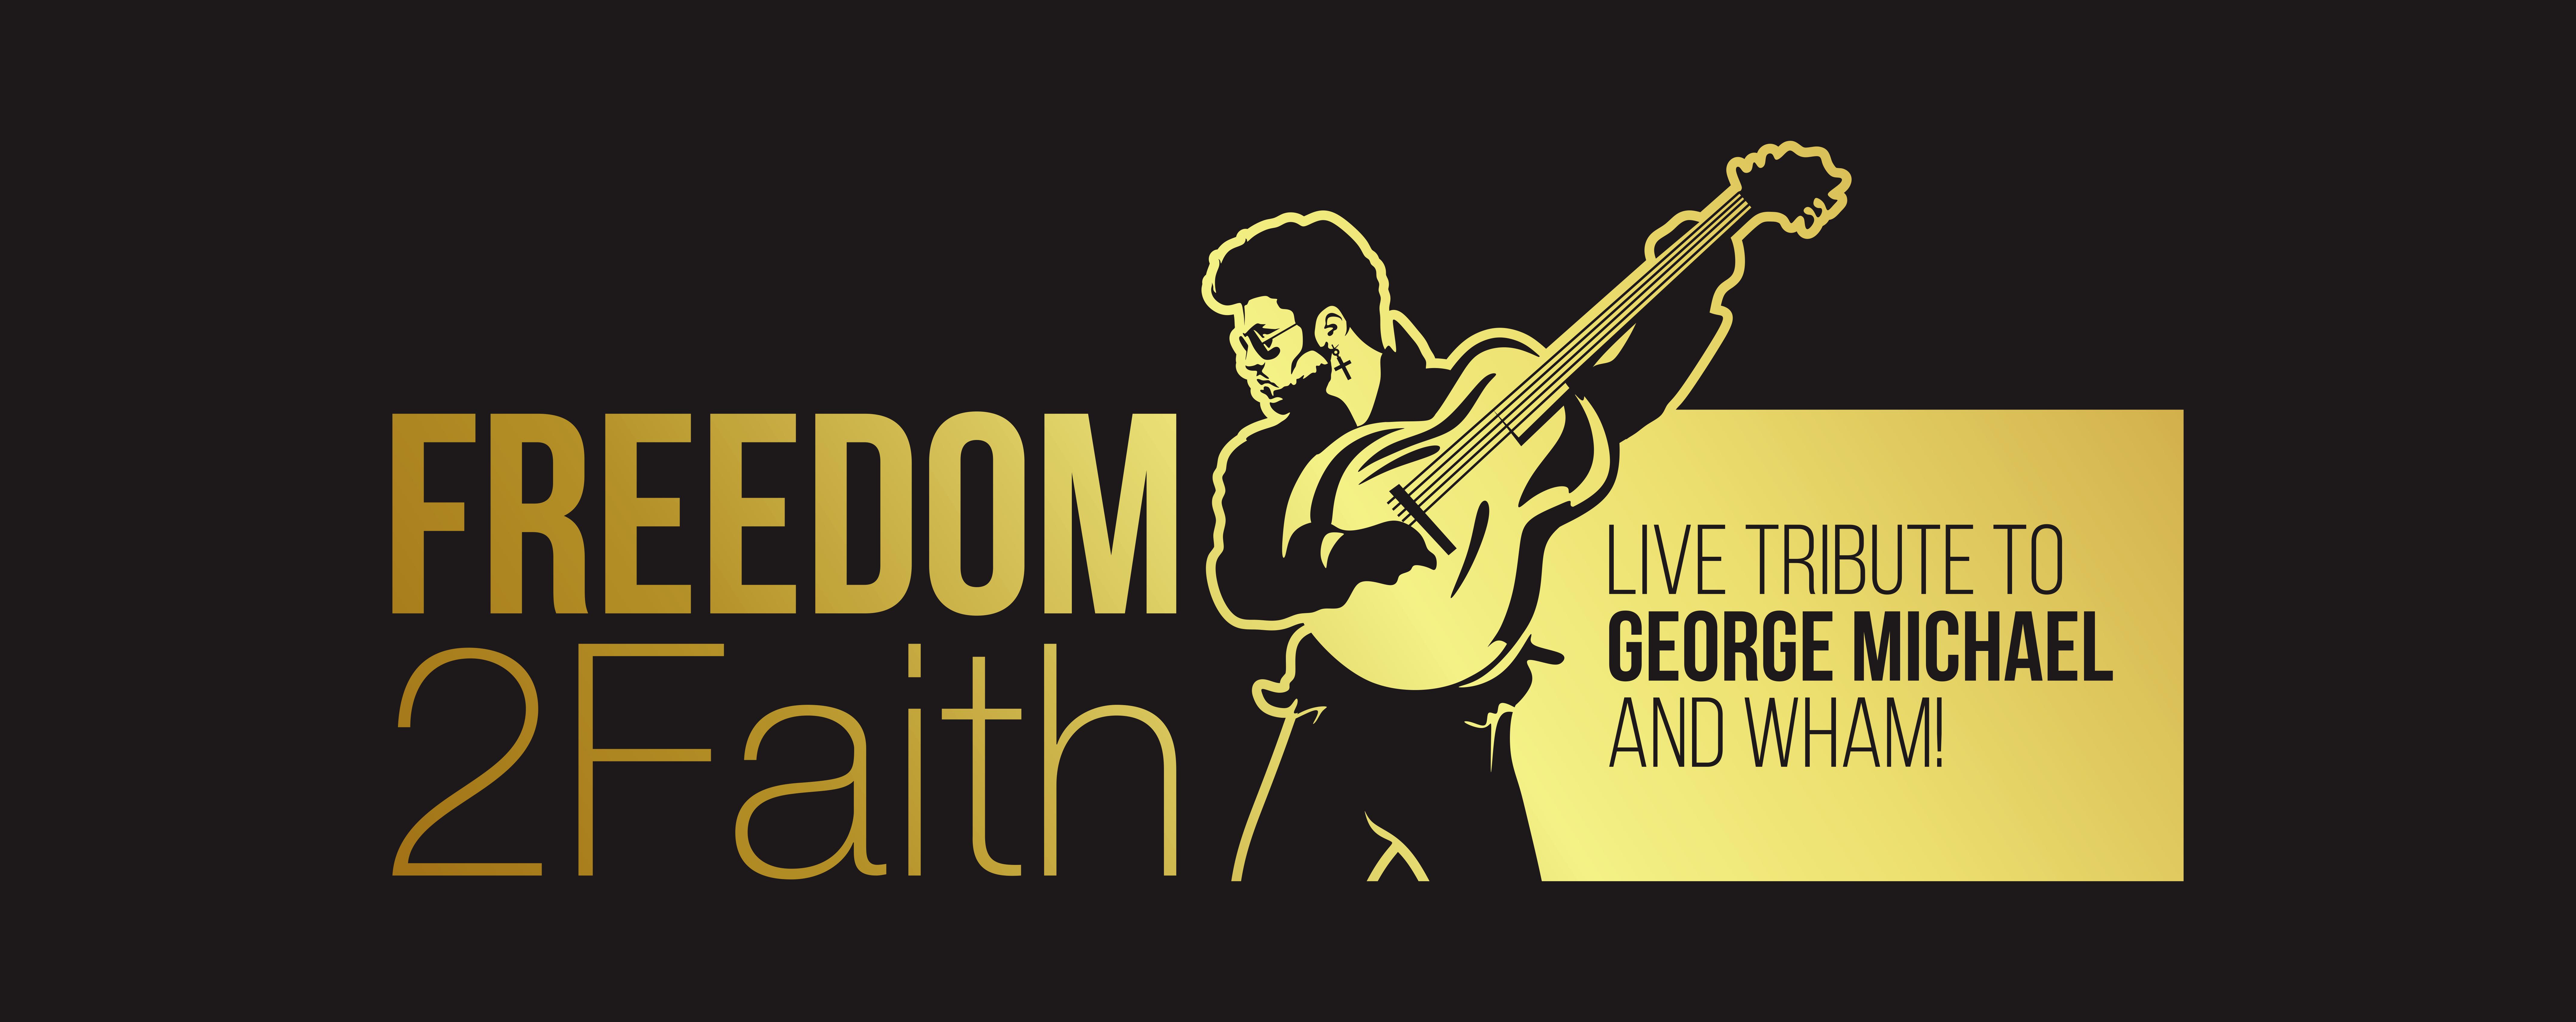 George Michael - Wham tribute band logo.